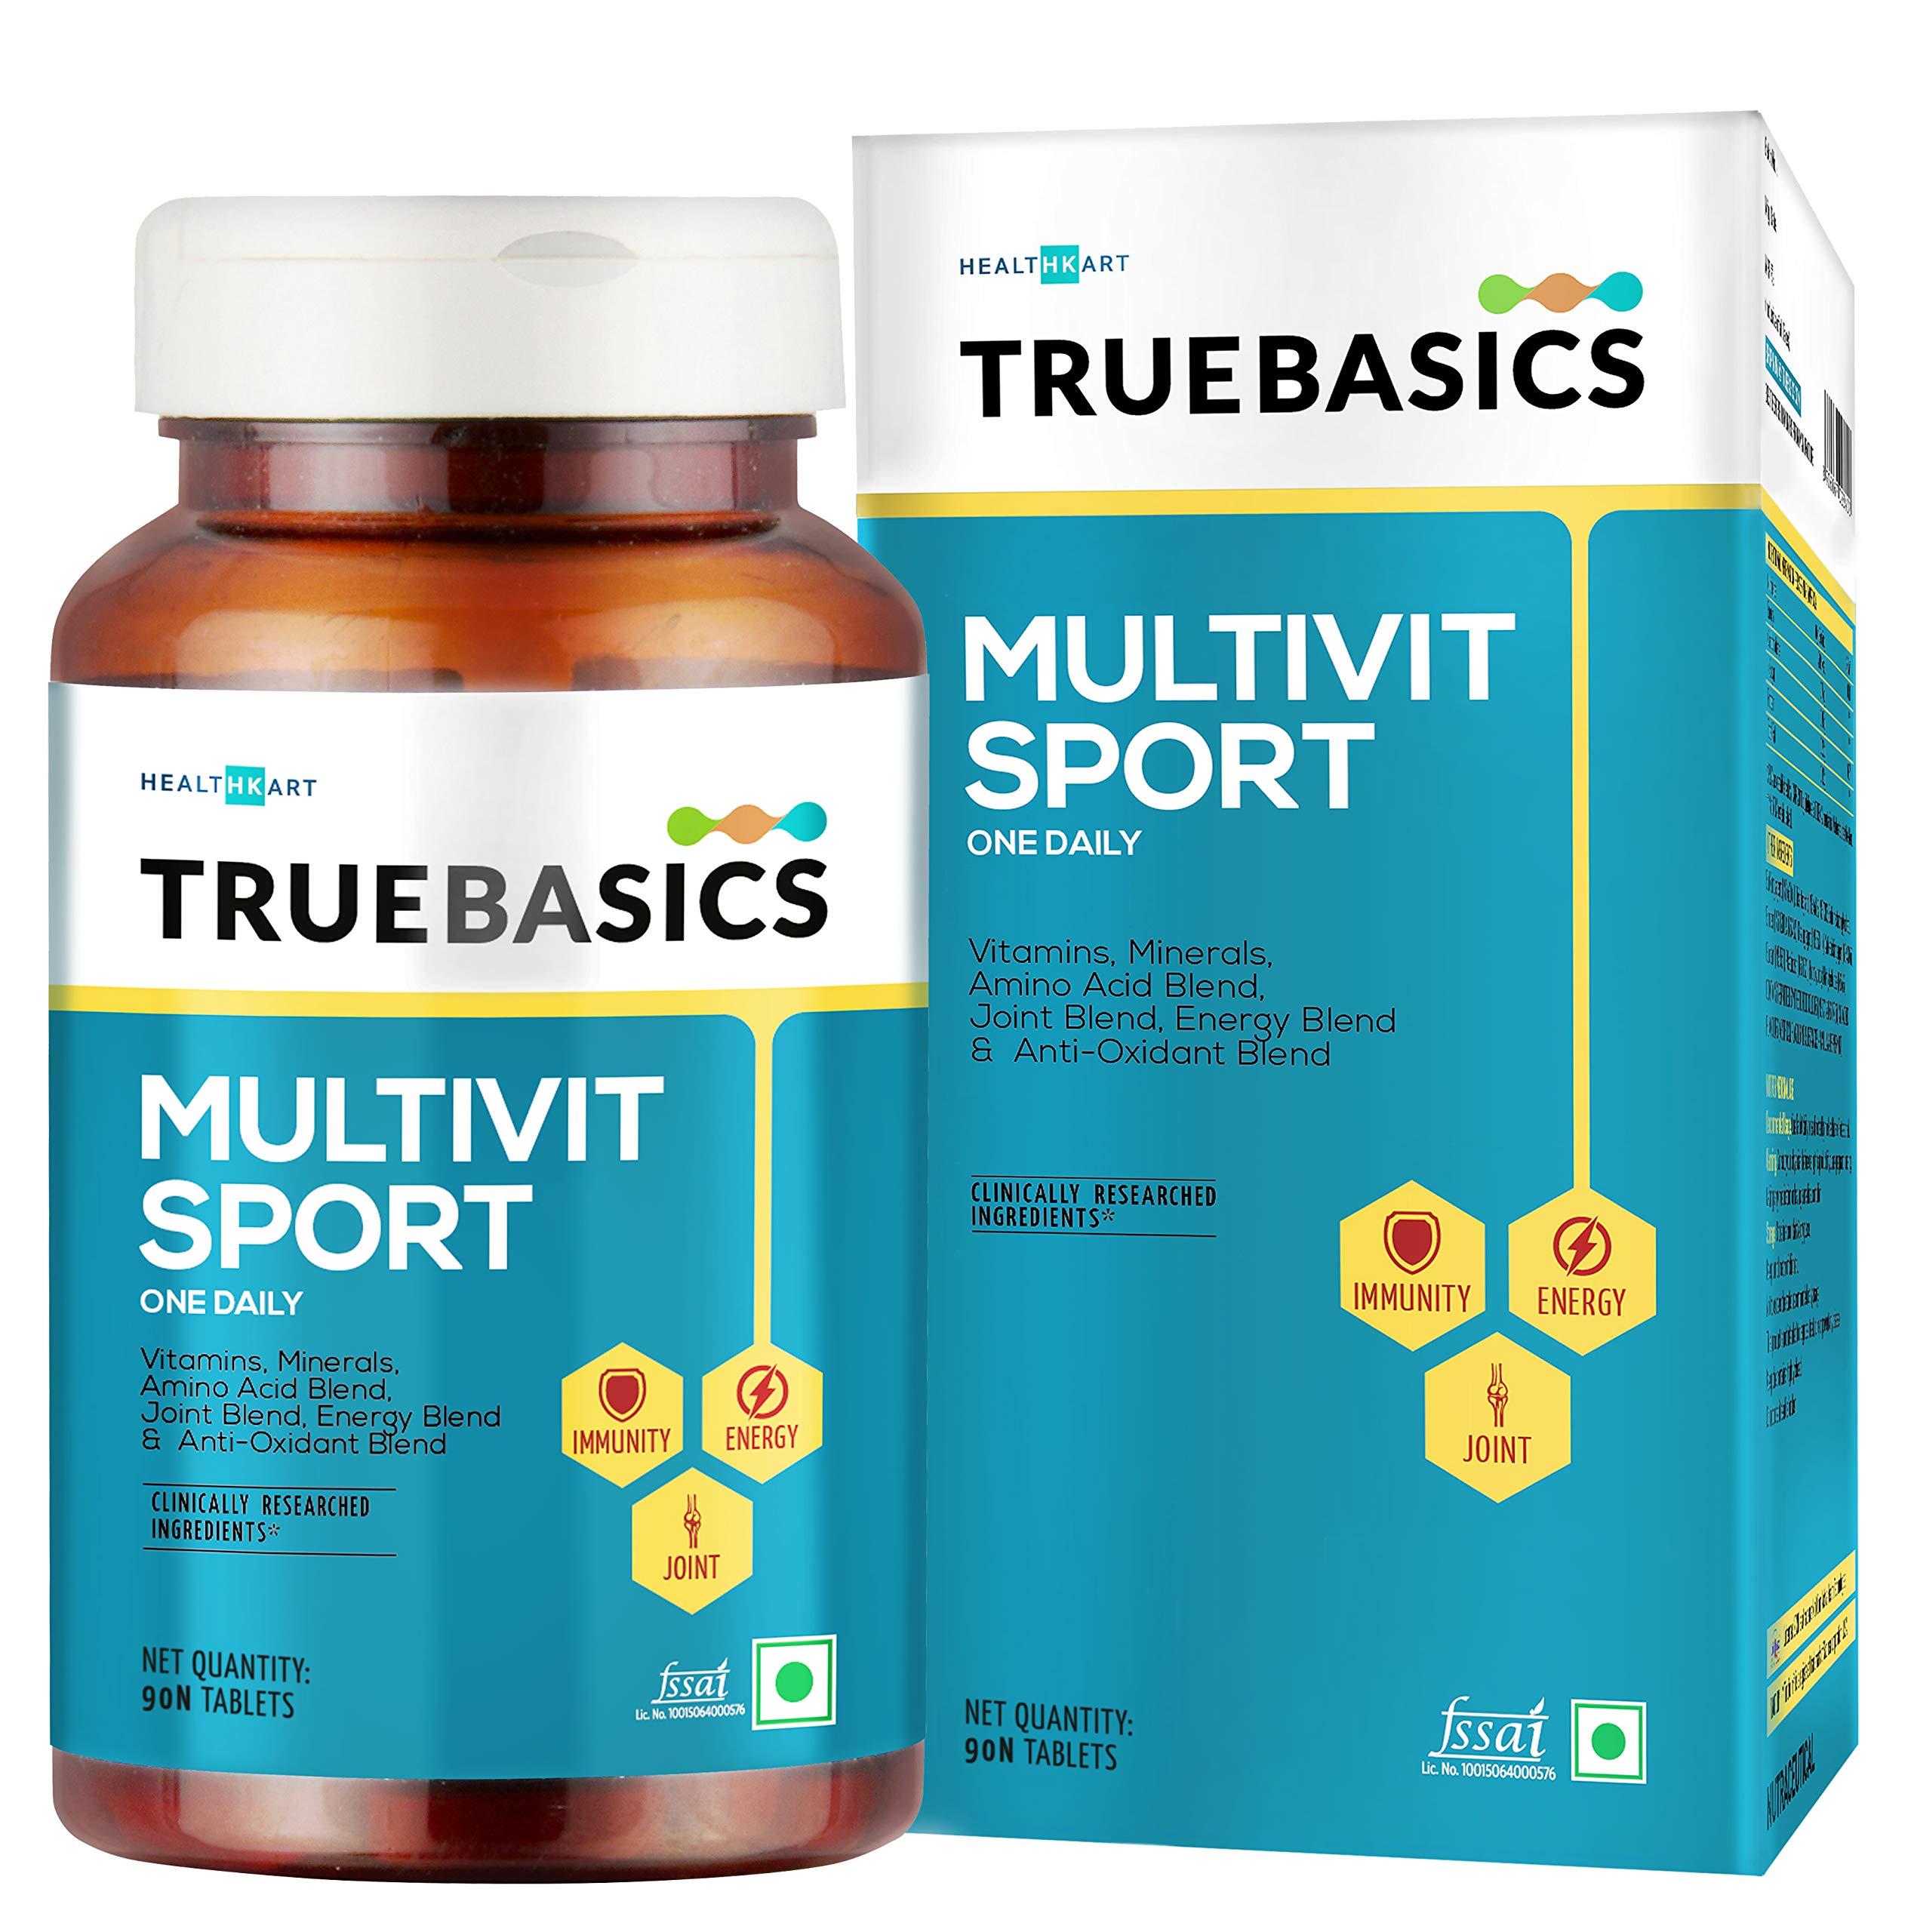 TrueBasics Multivit Sport One Daily, Multivitamin , Multiminerals, Anti-oxidants, Amino Acids with Joint & Energy Blends, 90 Veg Tablet(s)